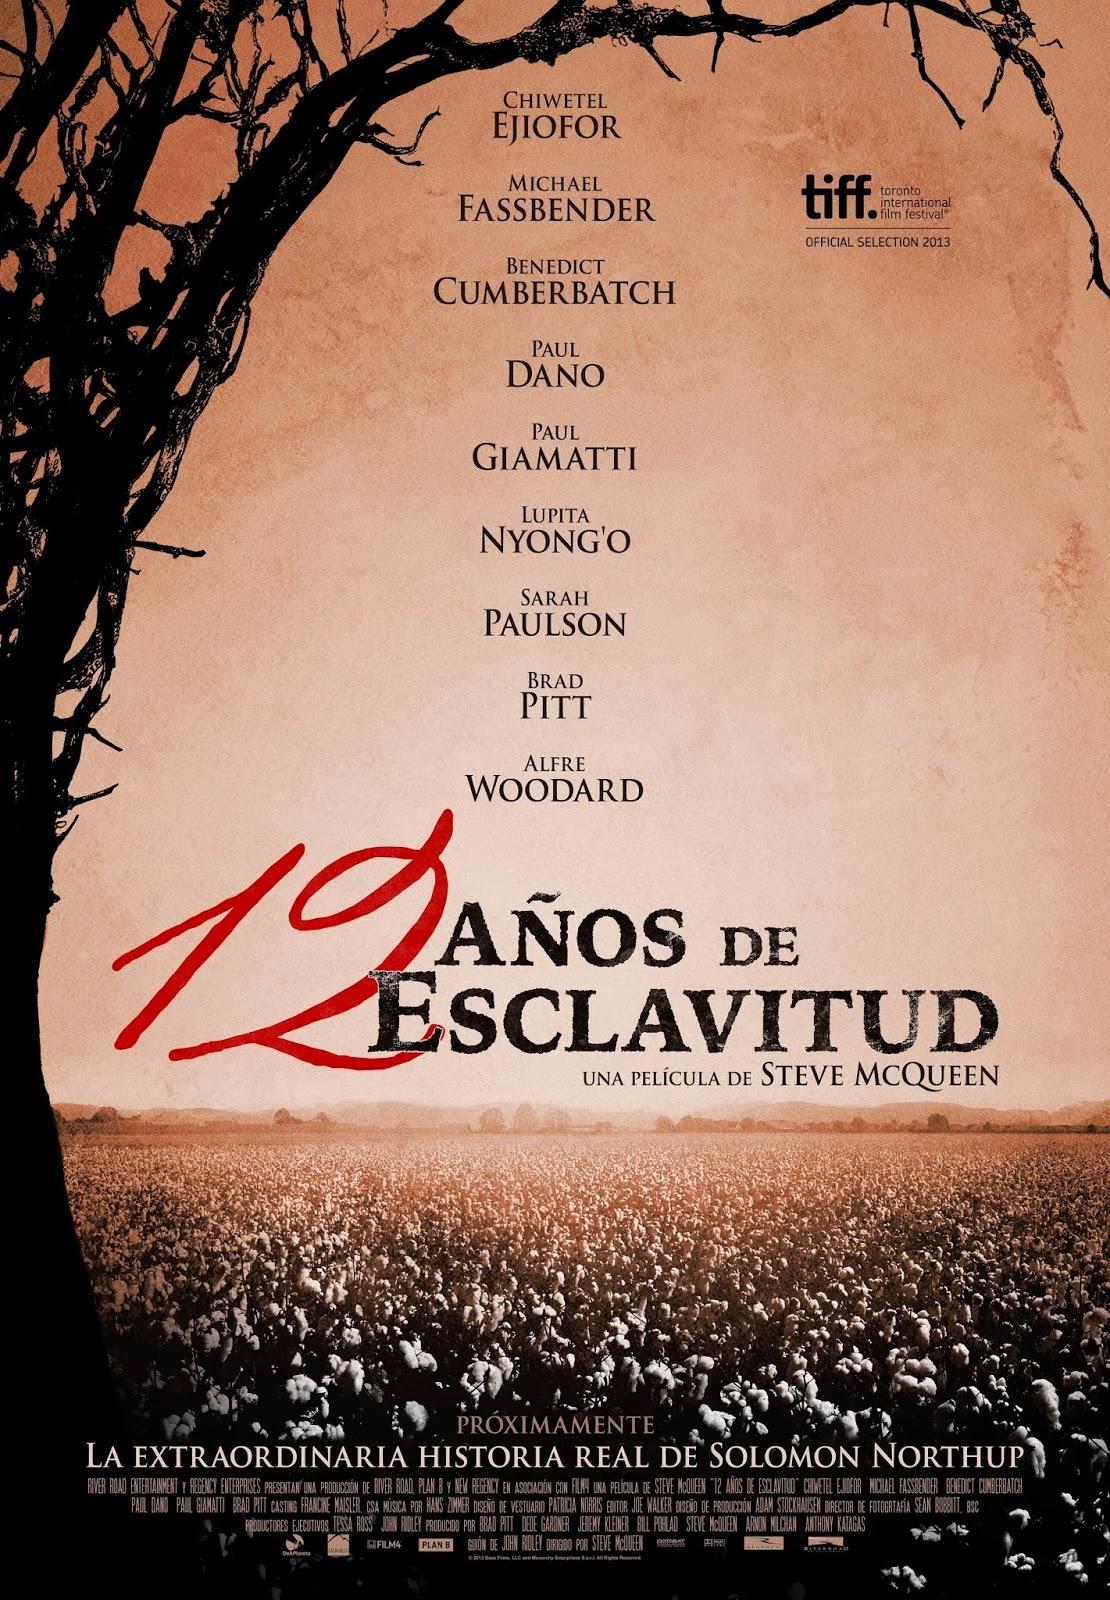 reunirse Español esclavitud en Bilbao